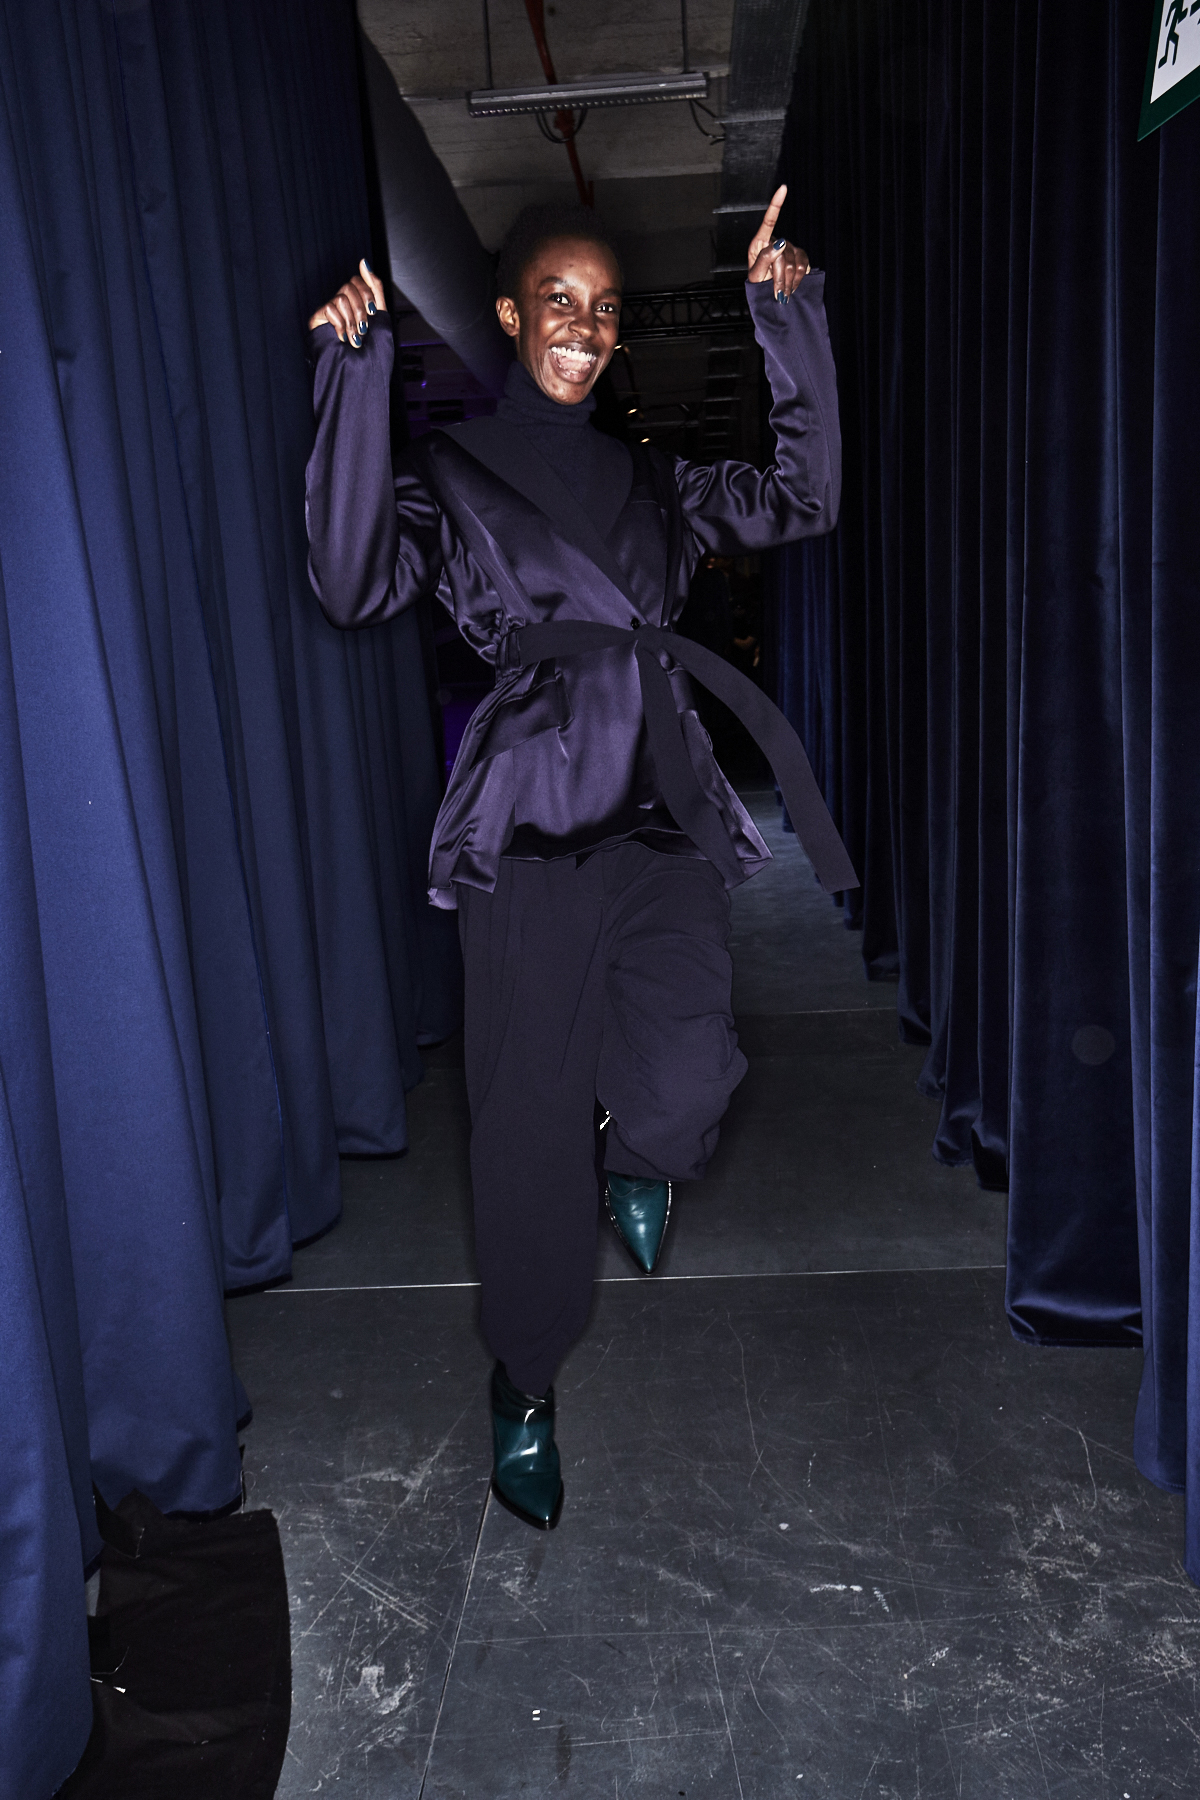 sonny vandevelde paul smith aw1819 wo men fashion show paris backstage. Black Bedroom Furniture Sets. Home Design Ideas